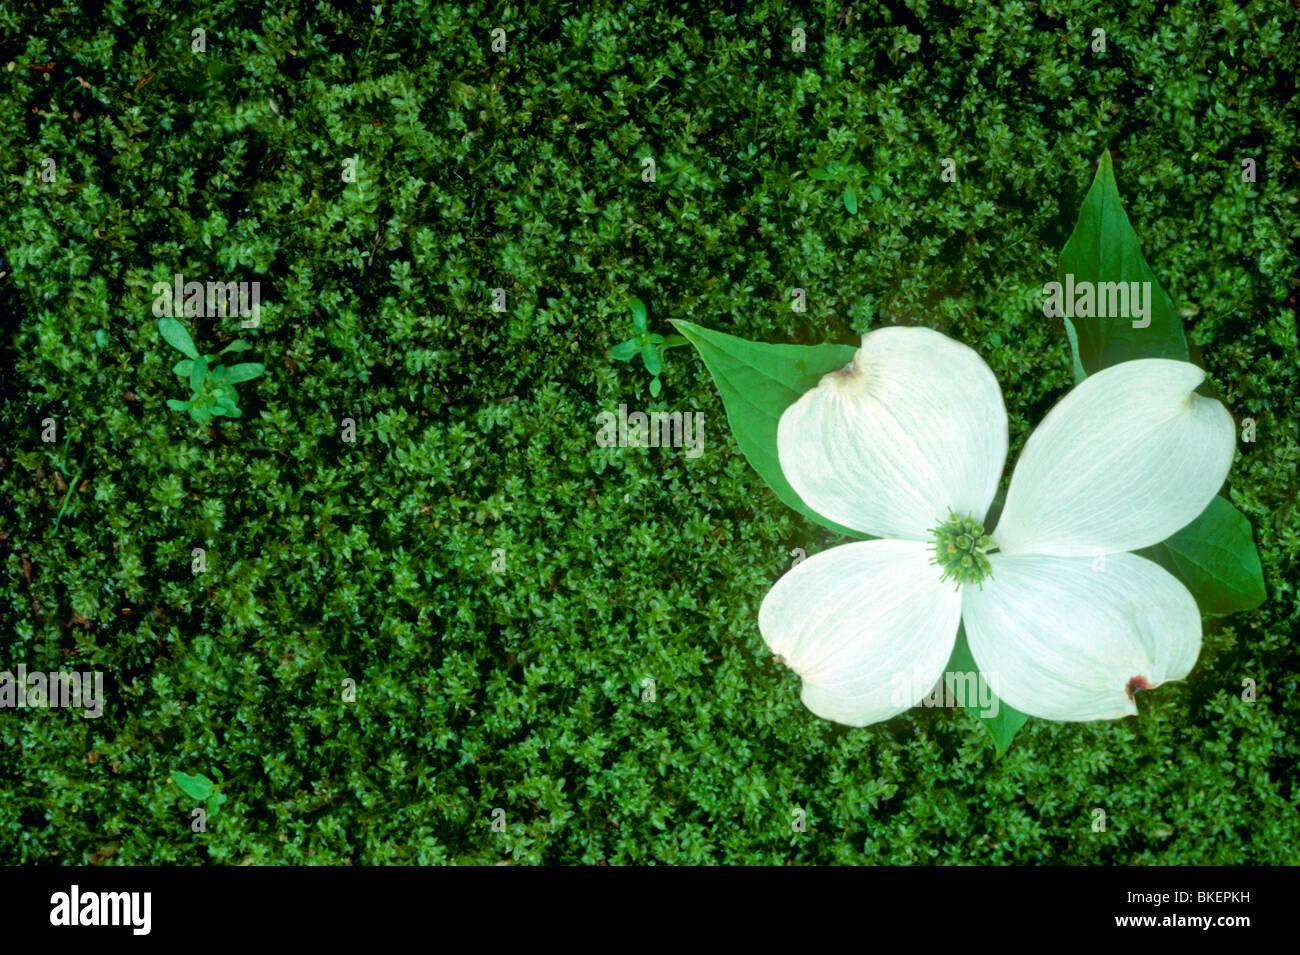 63f6c6c570 Dogwood flower lands intact on the green mossy garden floor below ...